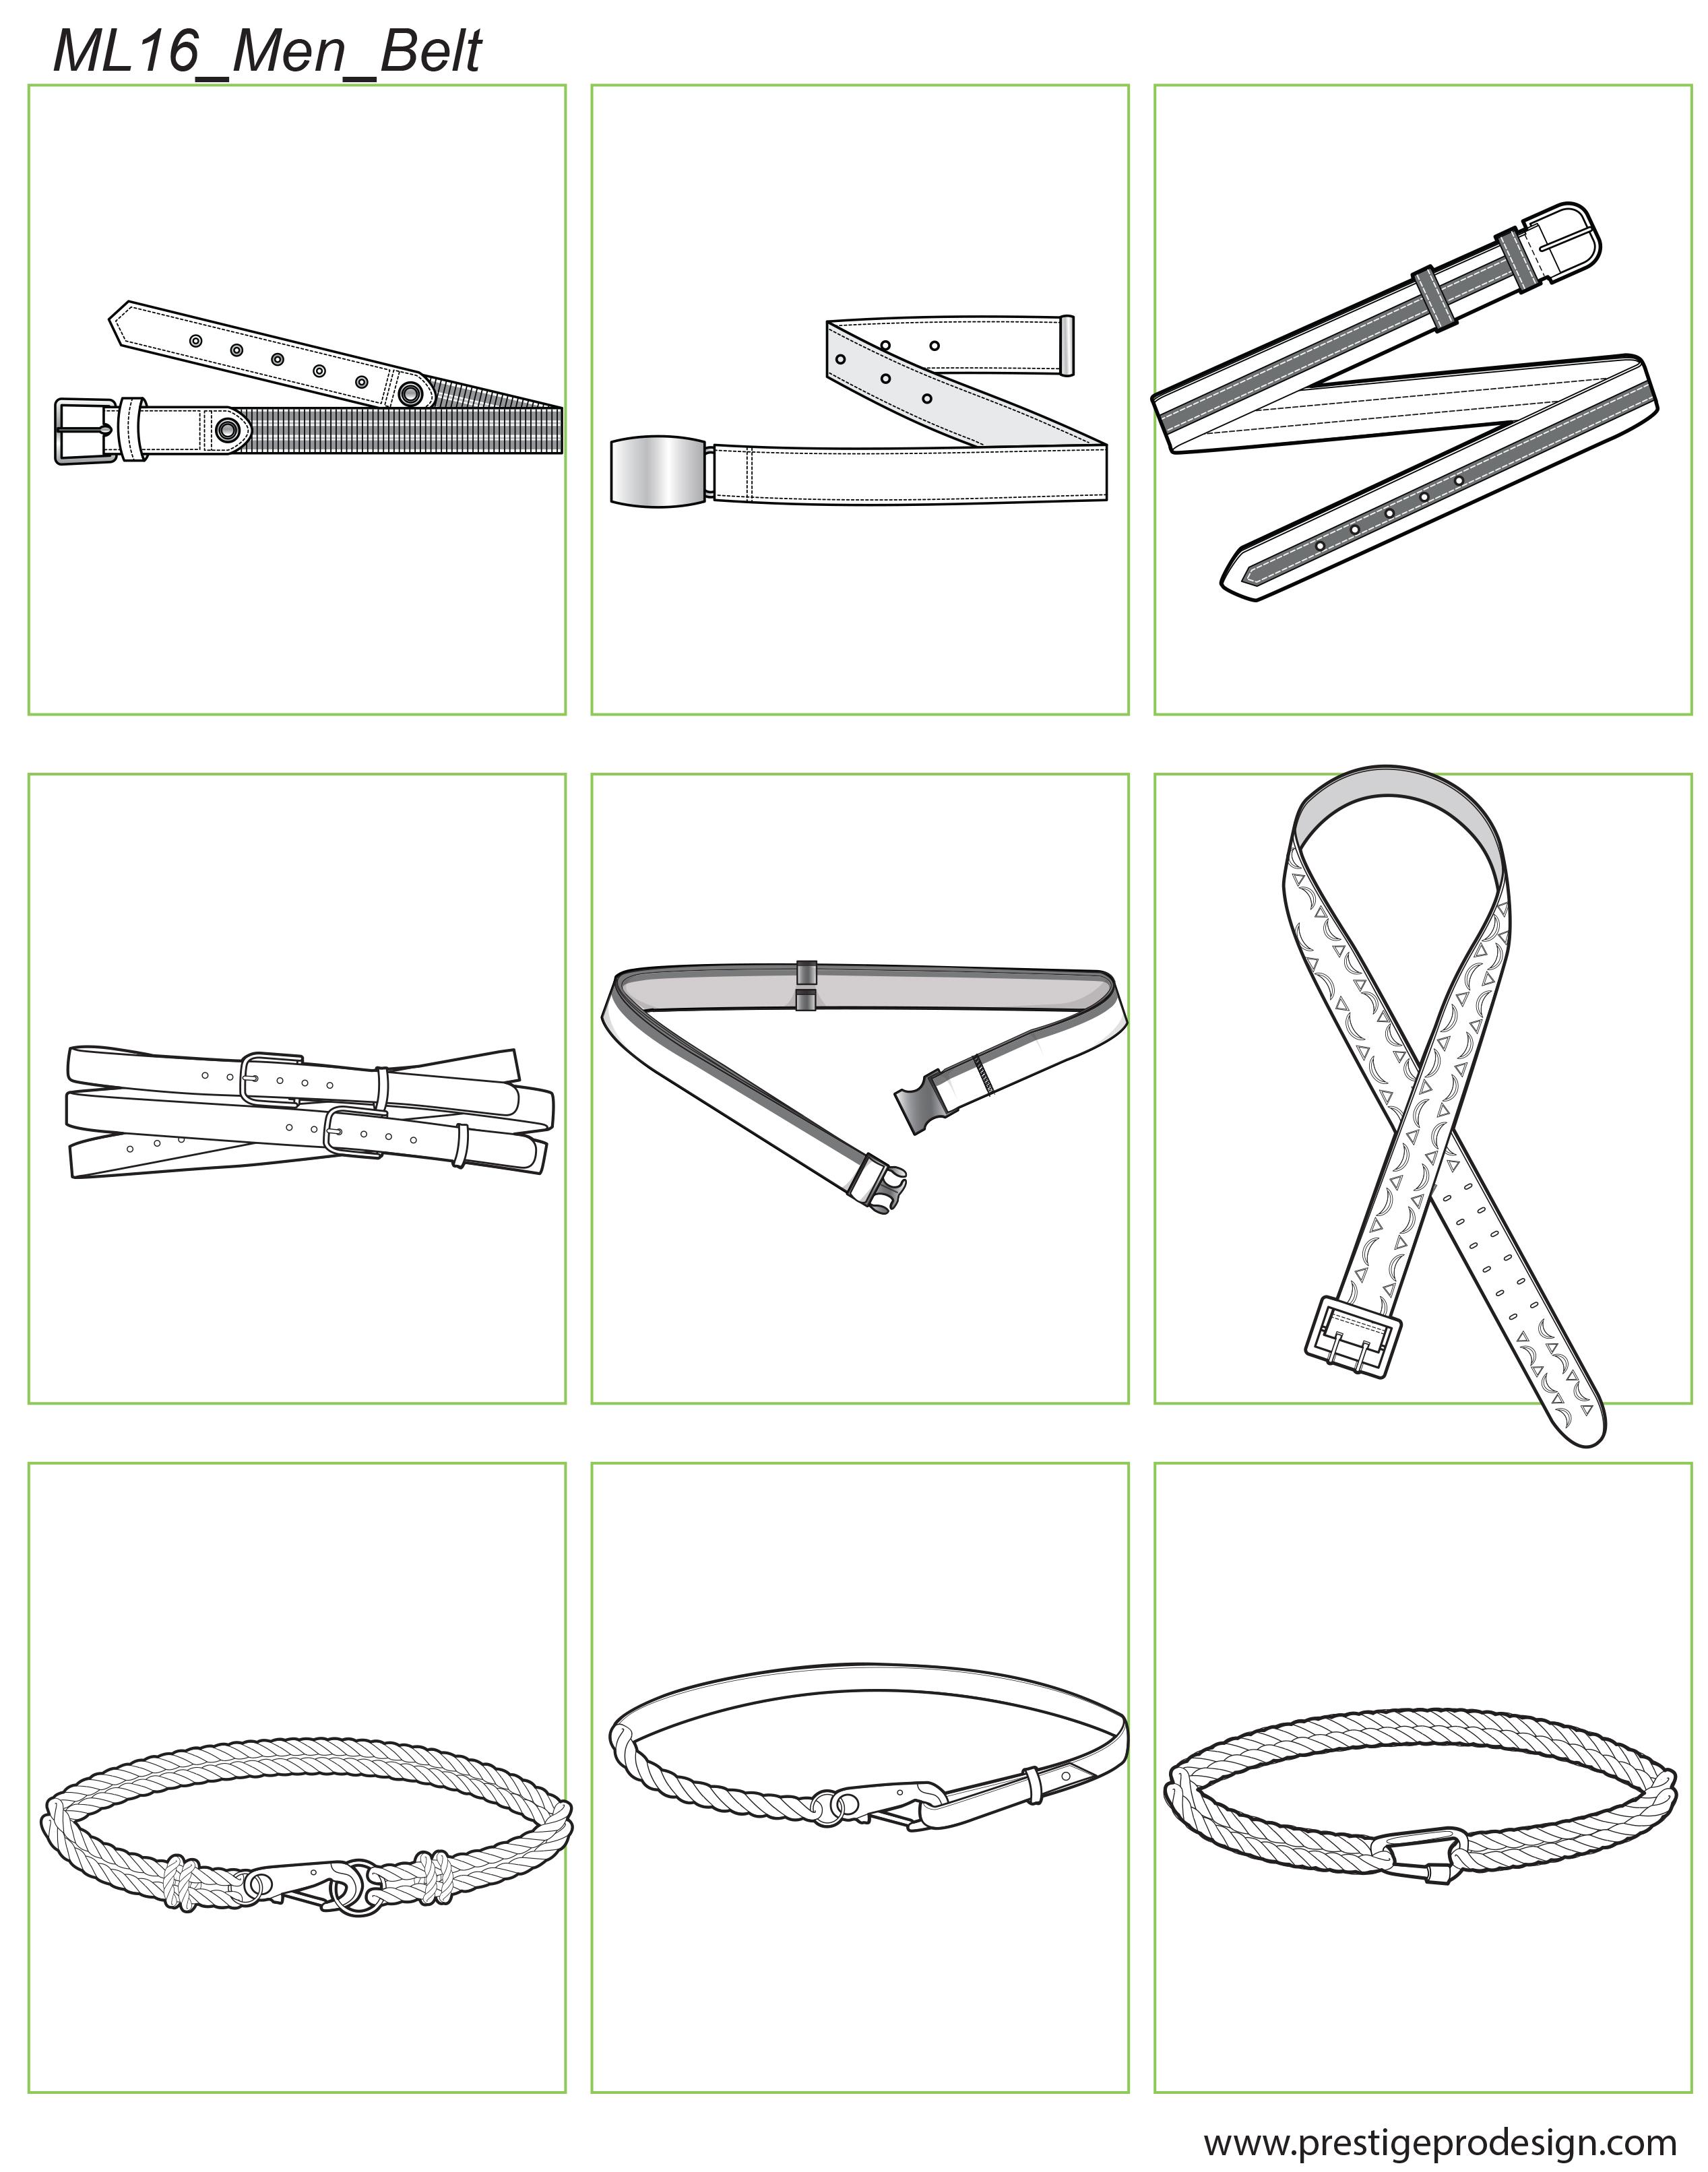 ML16_Men_Belt